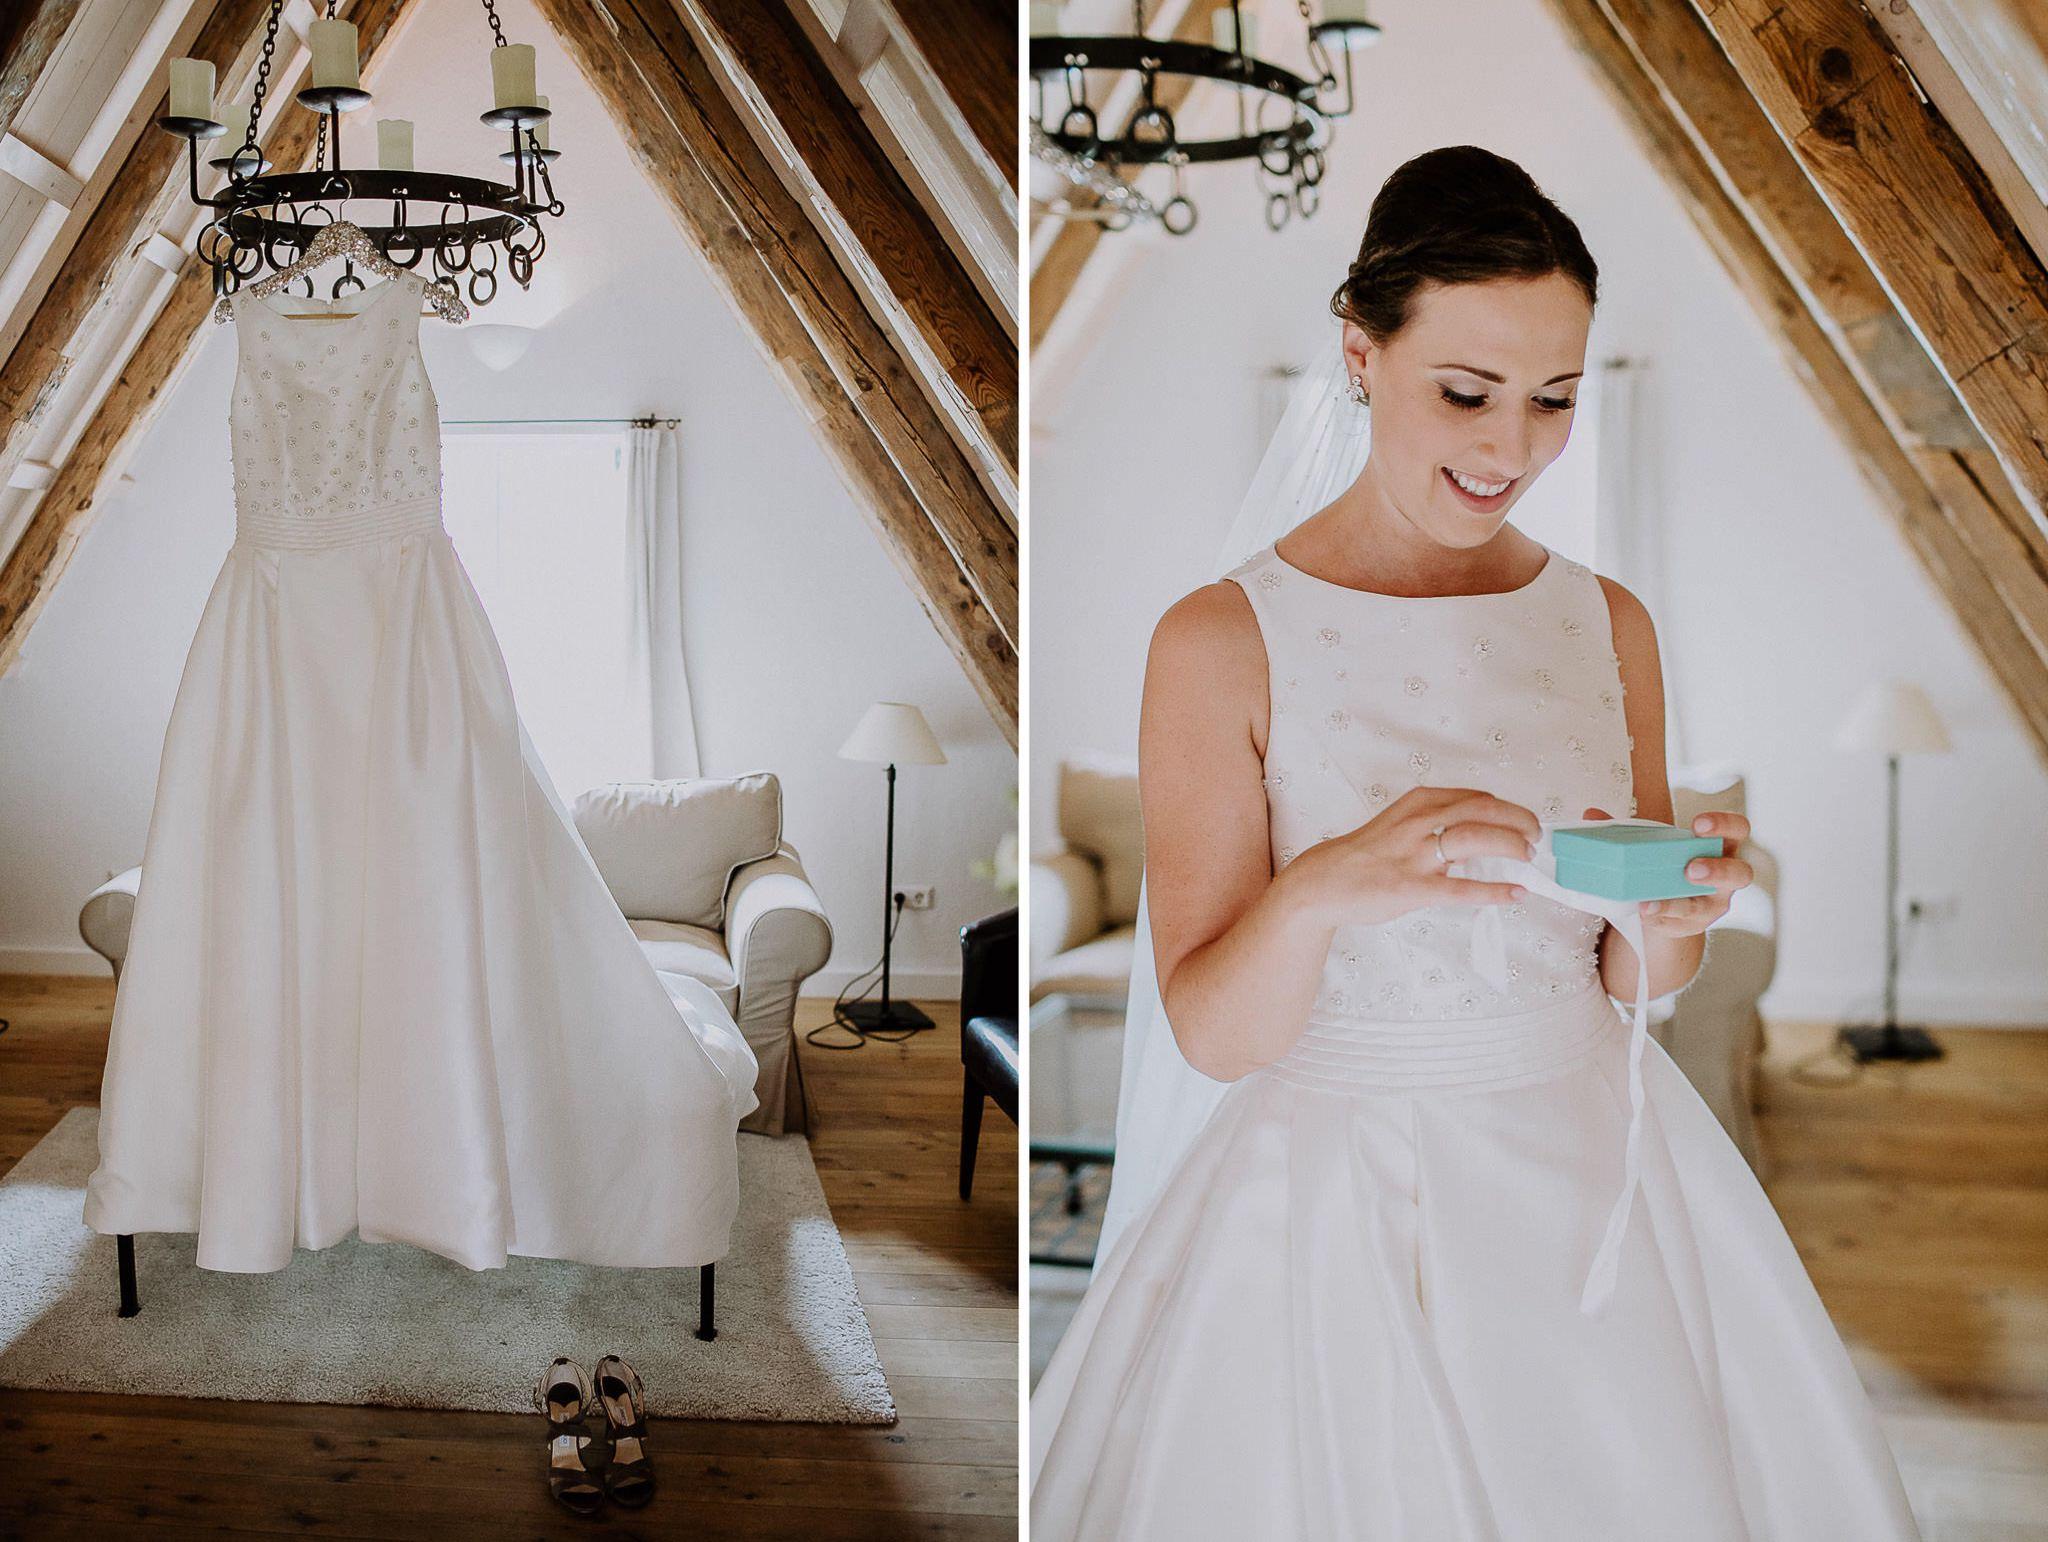 wedding photographer hamilton new zealand 1004 5